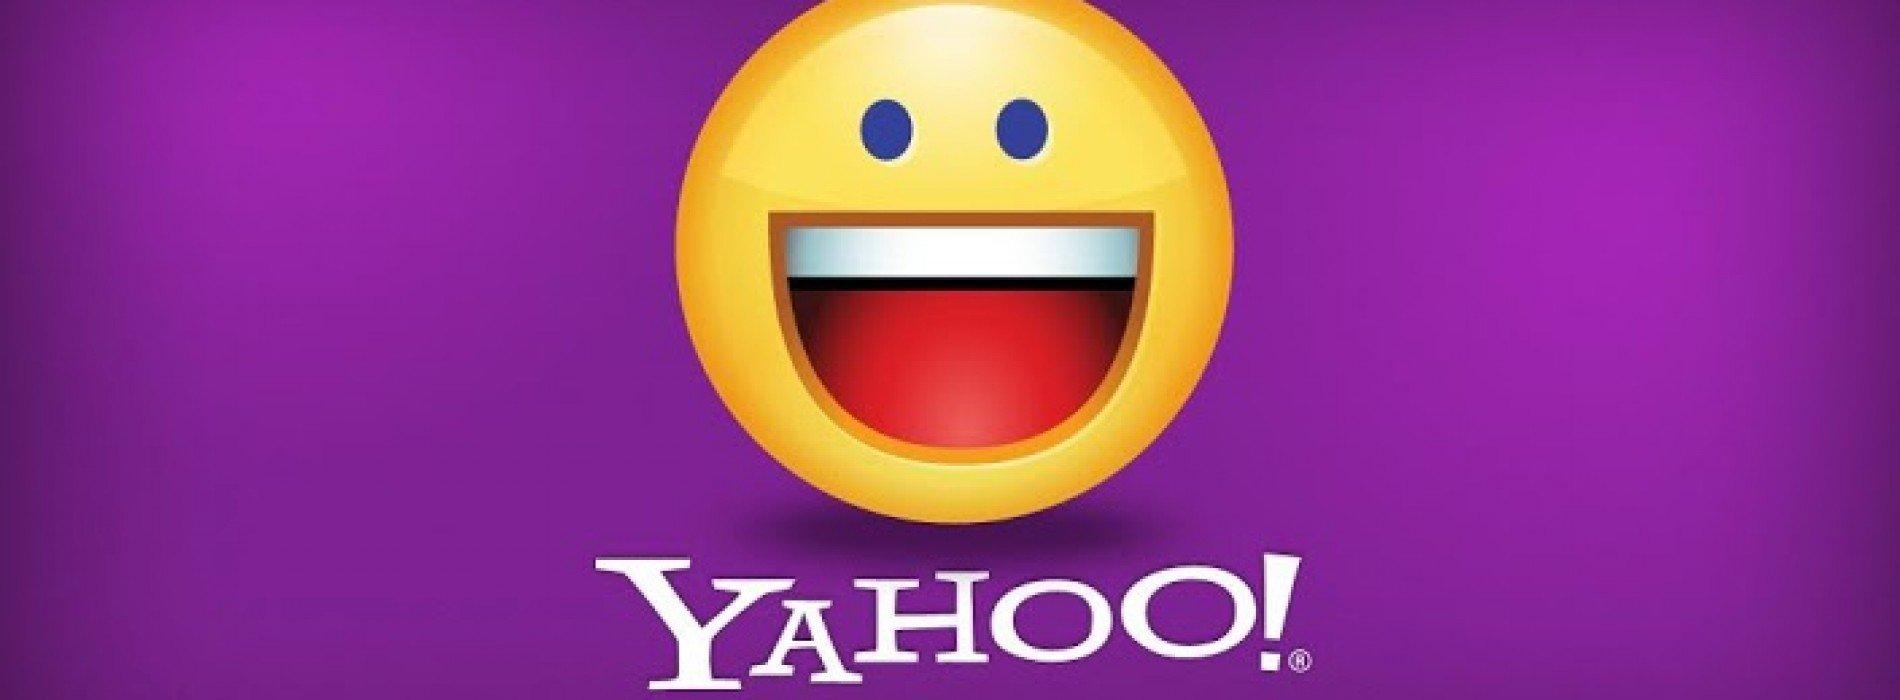 Google AOSP lead jumps to Yahoo!